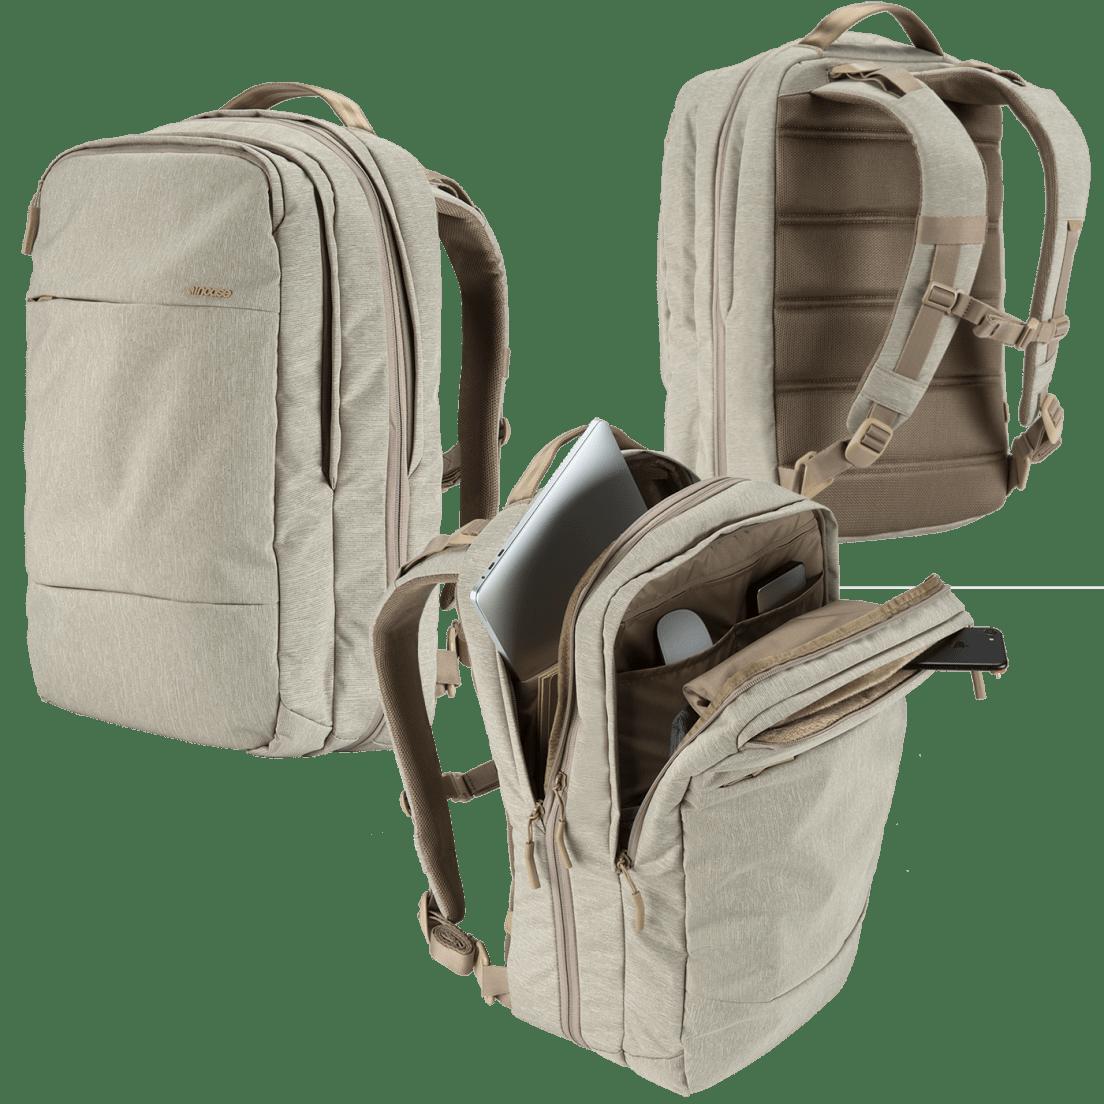 04f04f2039c0 Incase City Commuter Backpack (23L)